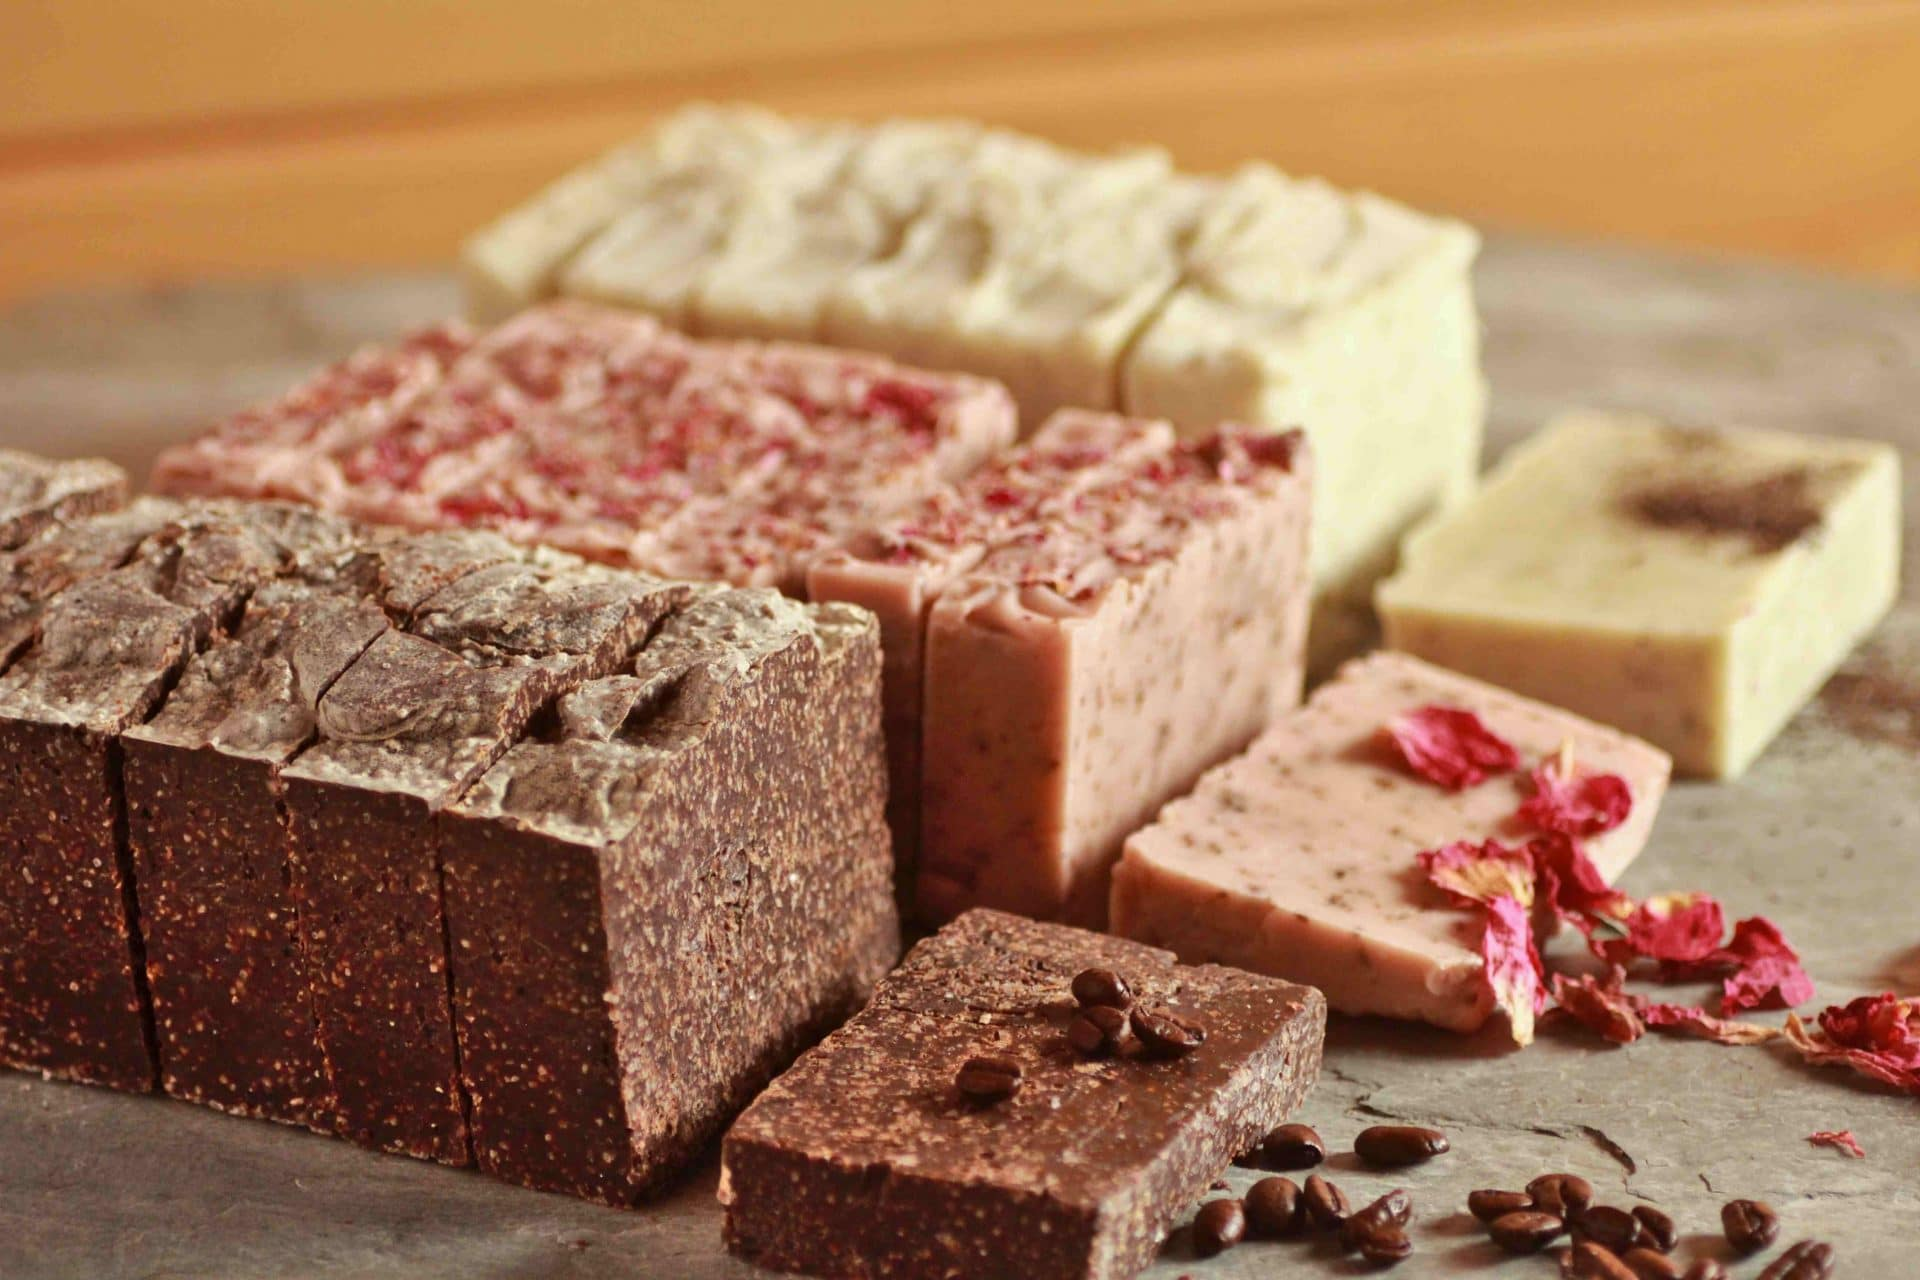 Salt Soap Recipe: Rustic Coffee Cocoa Salt Soap